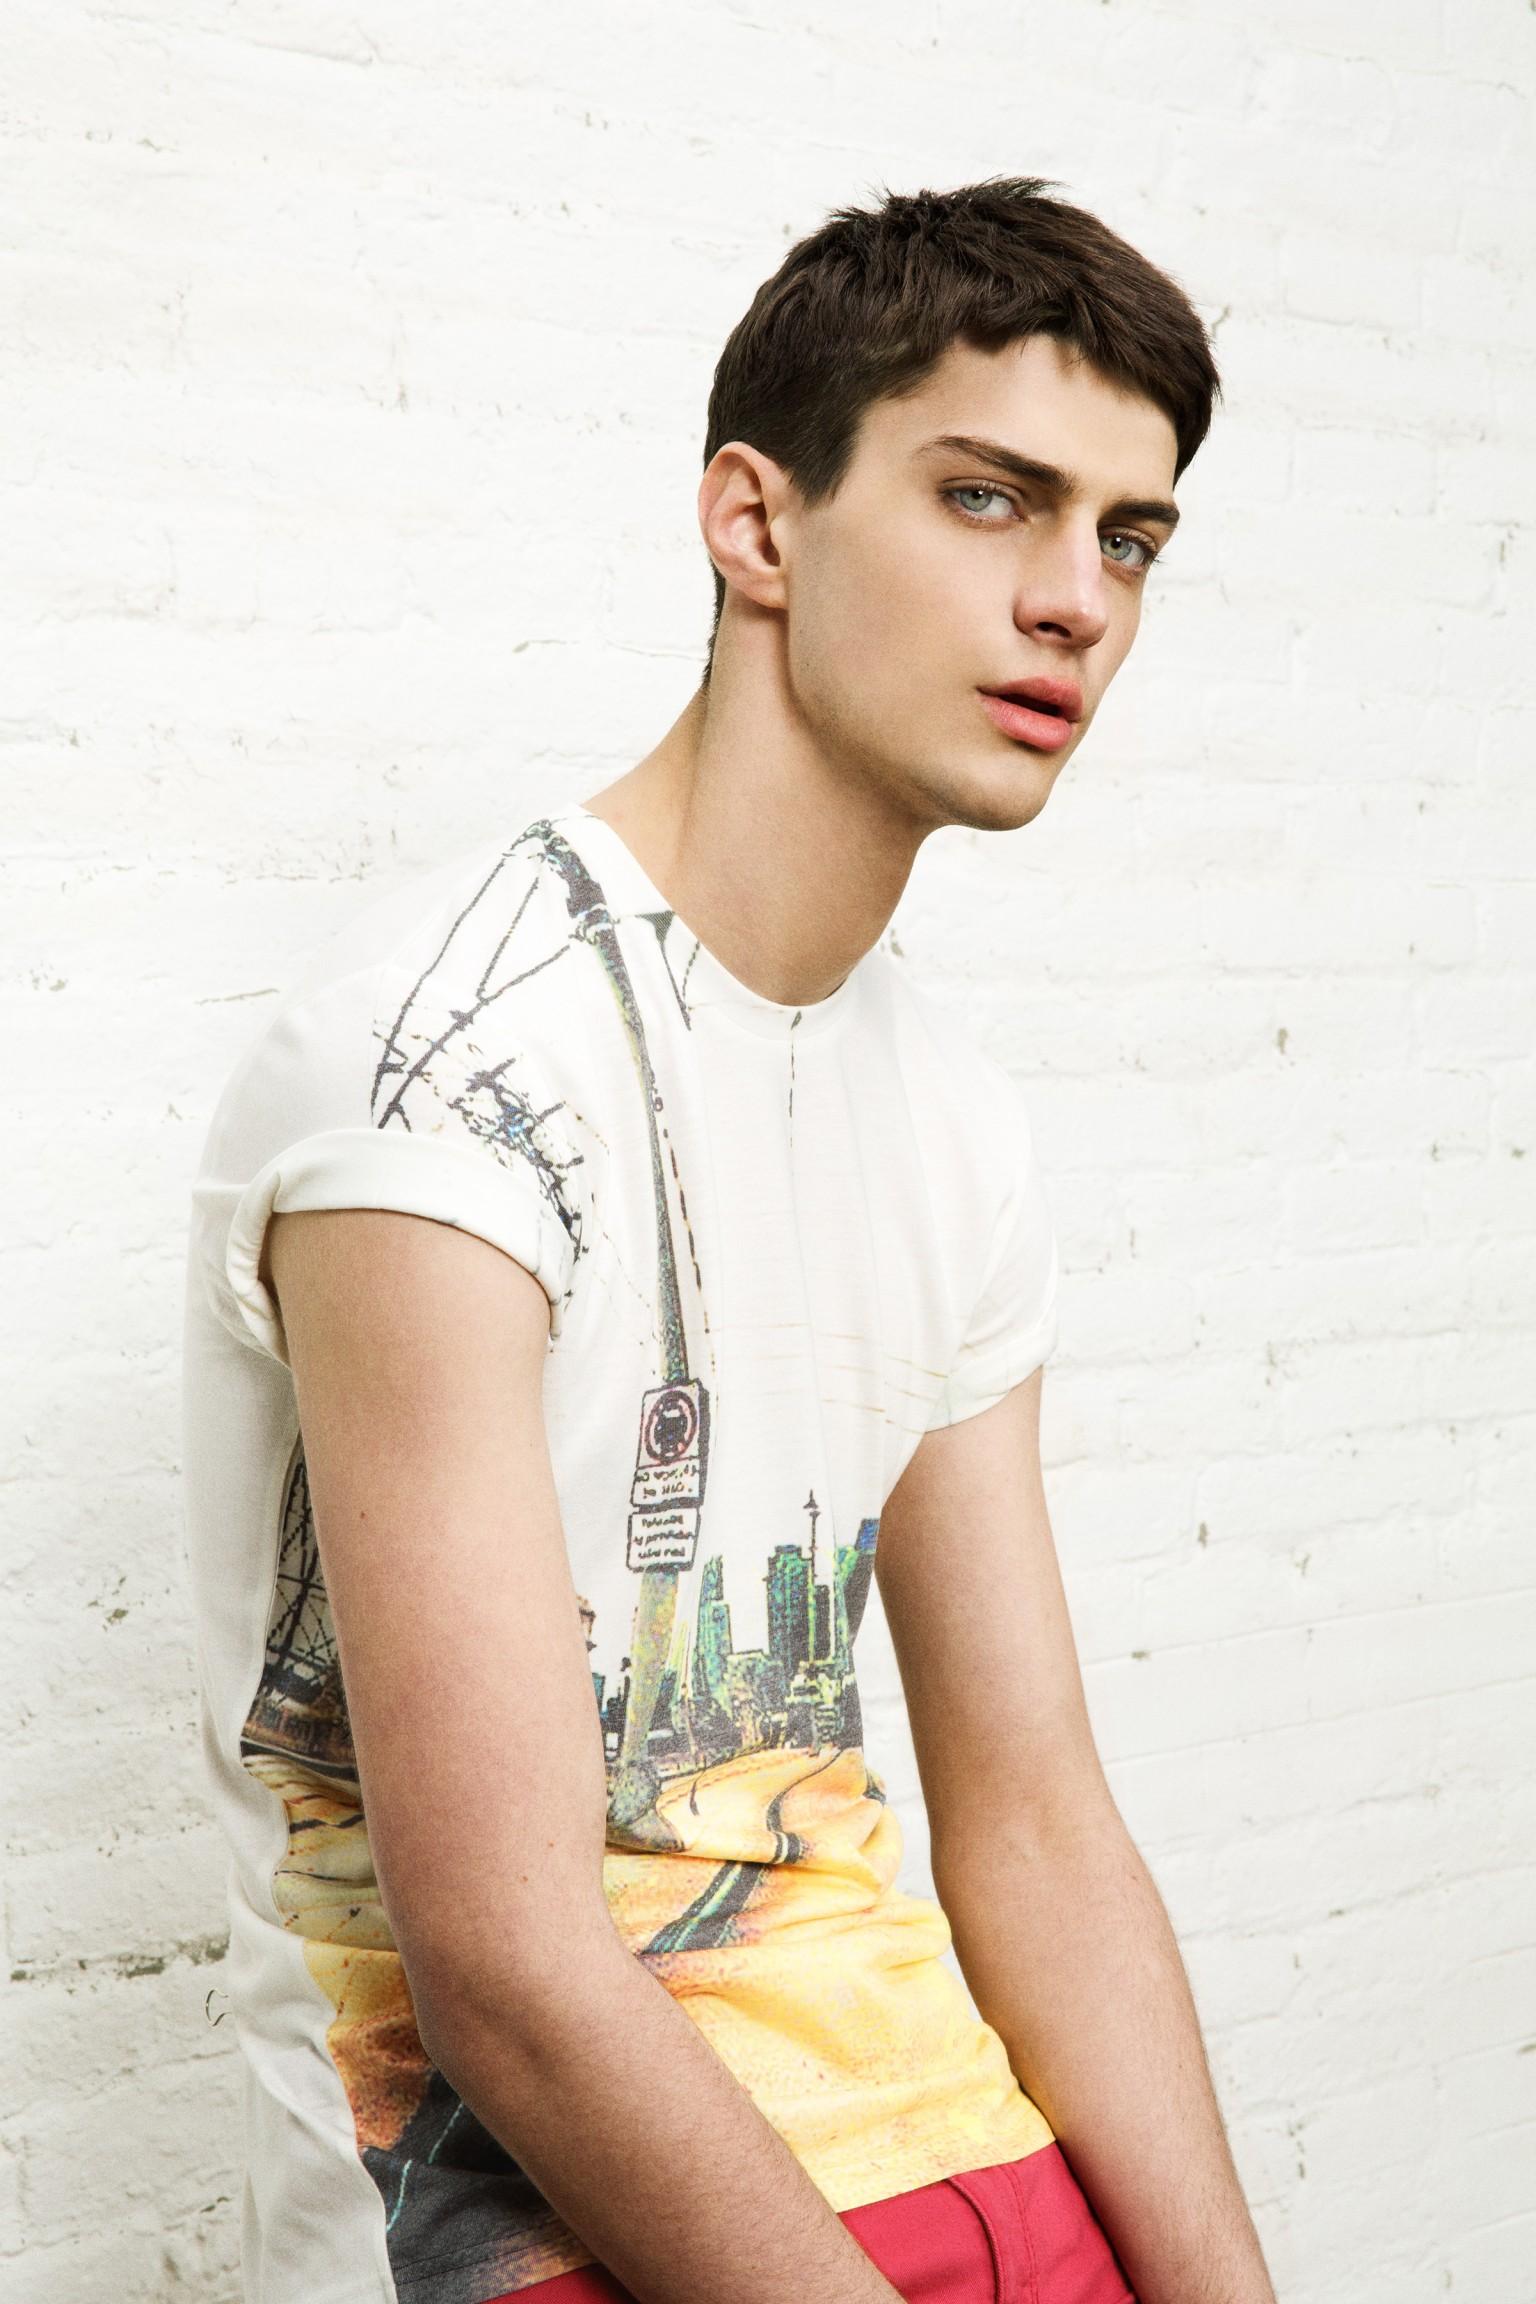 daniel-gonzalez-elizondo-estilista-stylist-summer-2013-clockhouse-20 School Bell Images